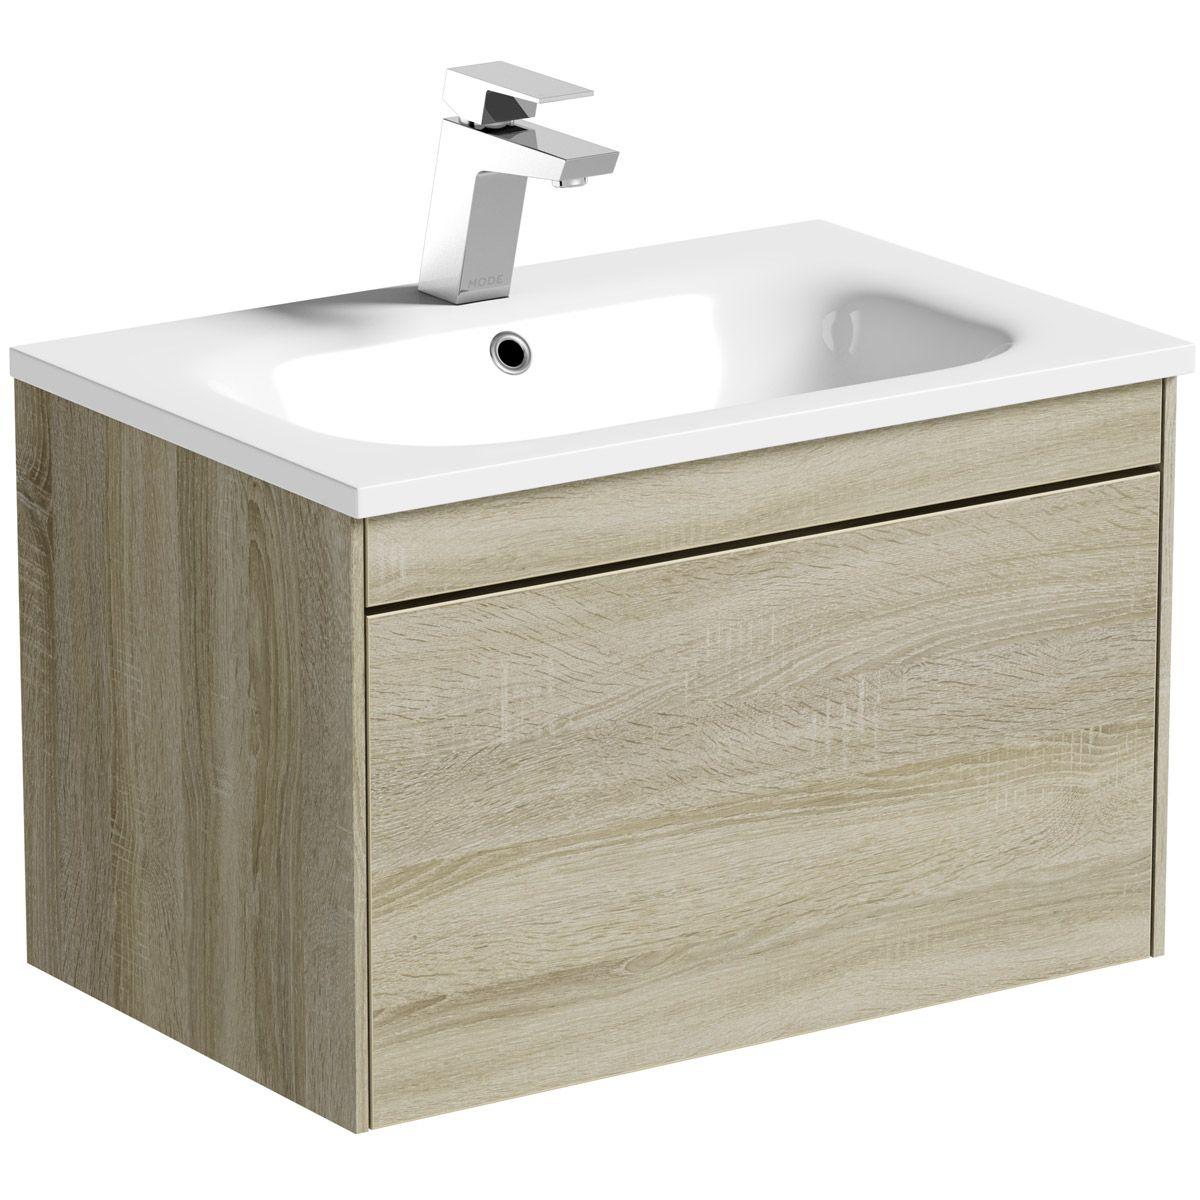 32+ Wall hung bathroom vanity unit 600mm inspiration